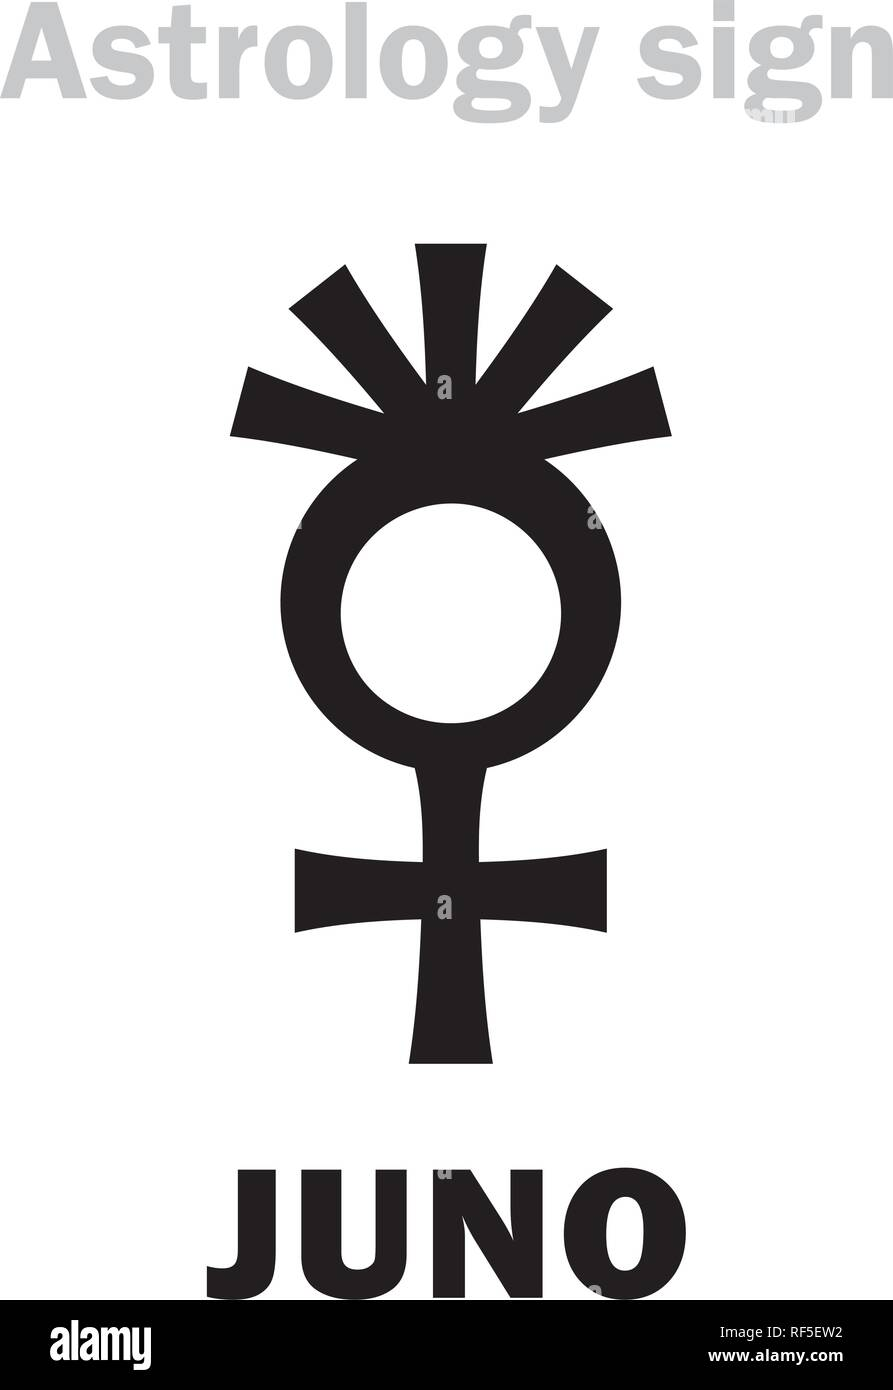 Astrology Alphabet: JUNO (Hera), classic asteroid #3  Hieroglyphics